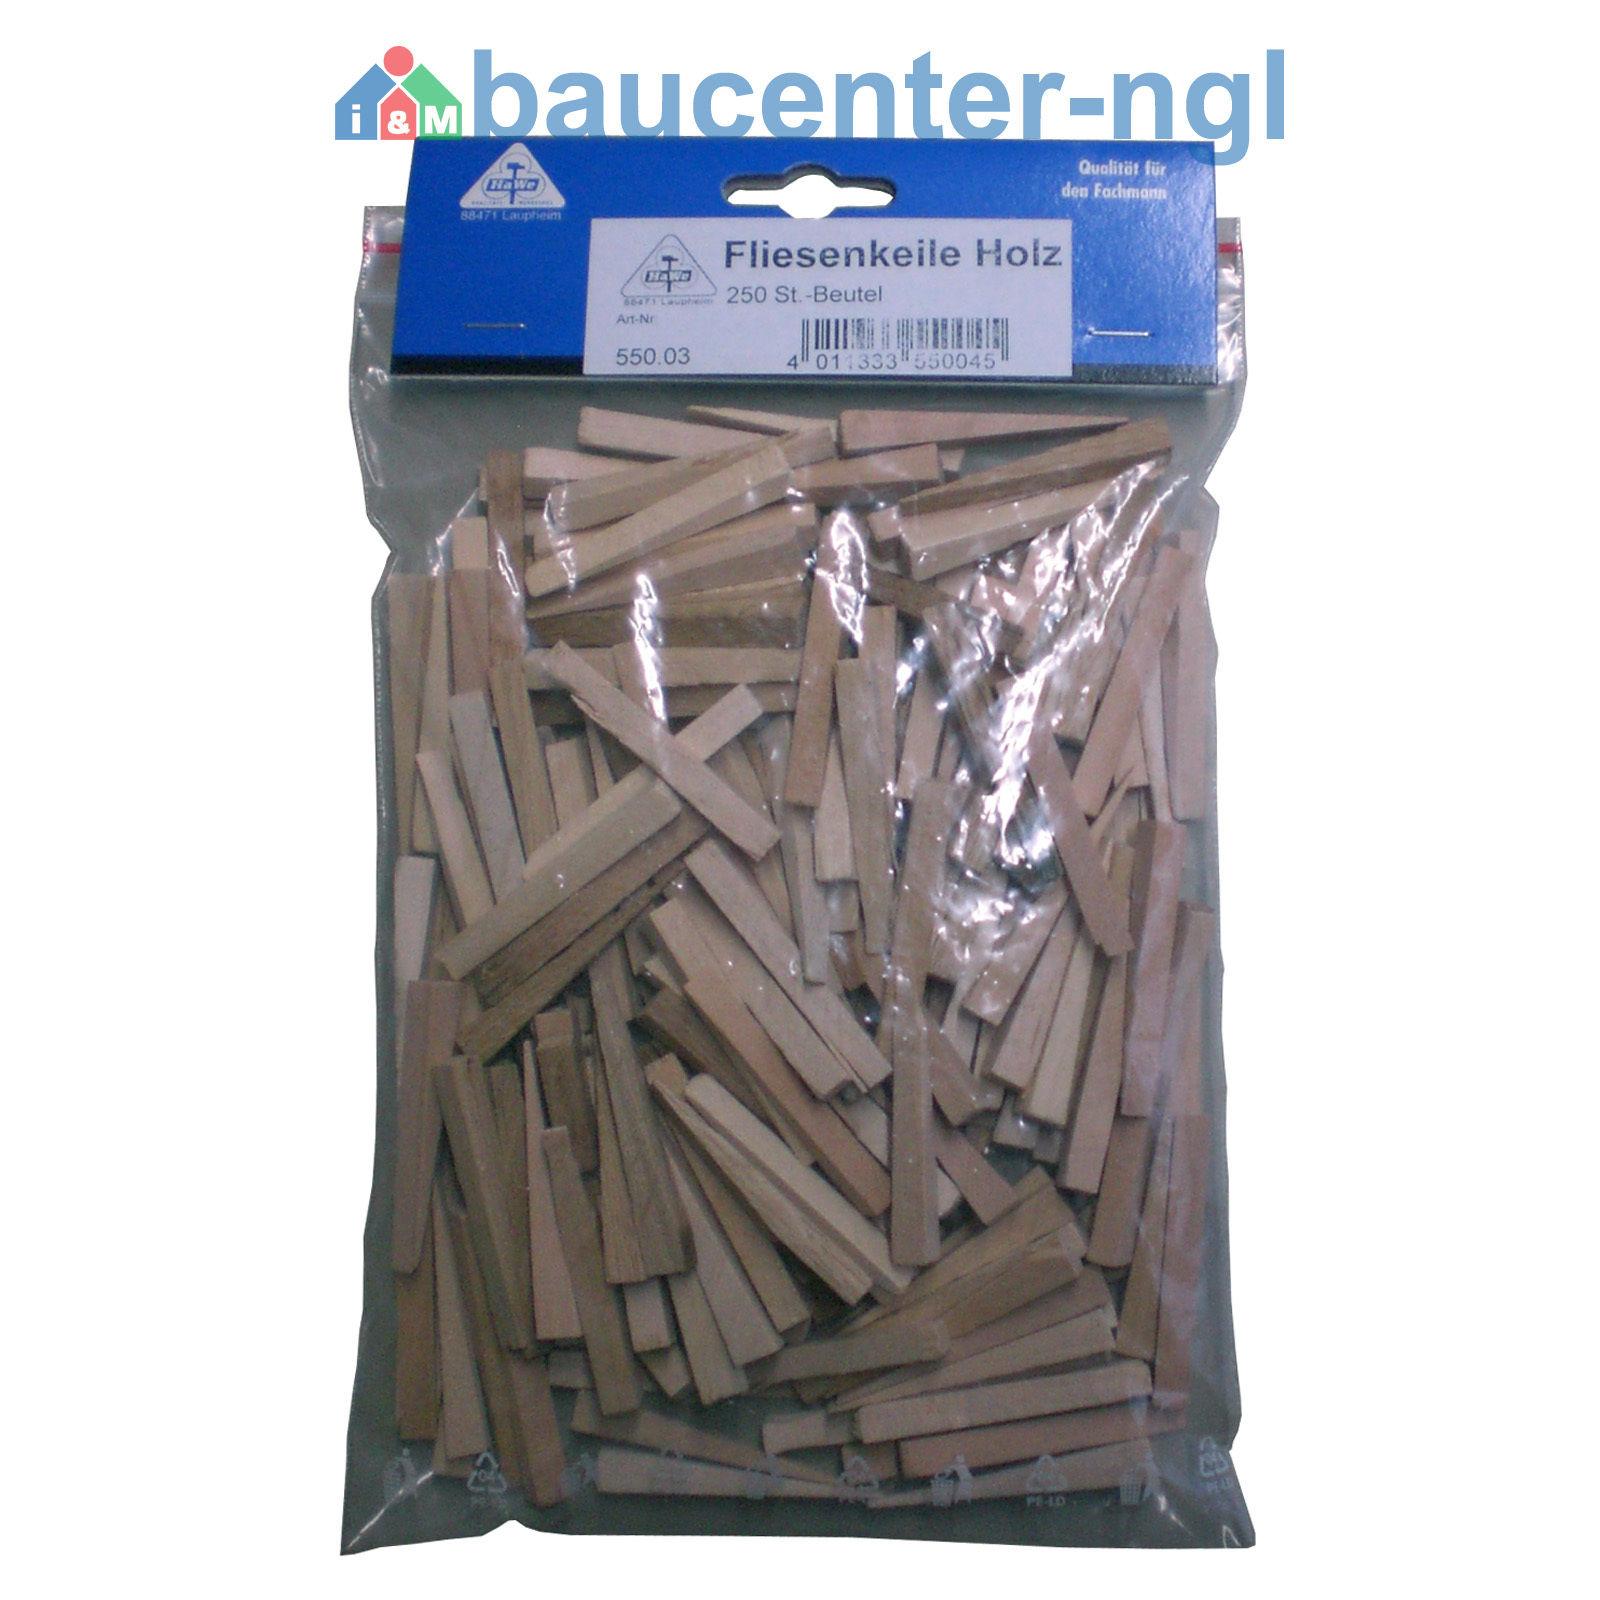 Fliesenkeile Kunststoff Holz 30x6x0-5mm 55x7x0-8,5mm